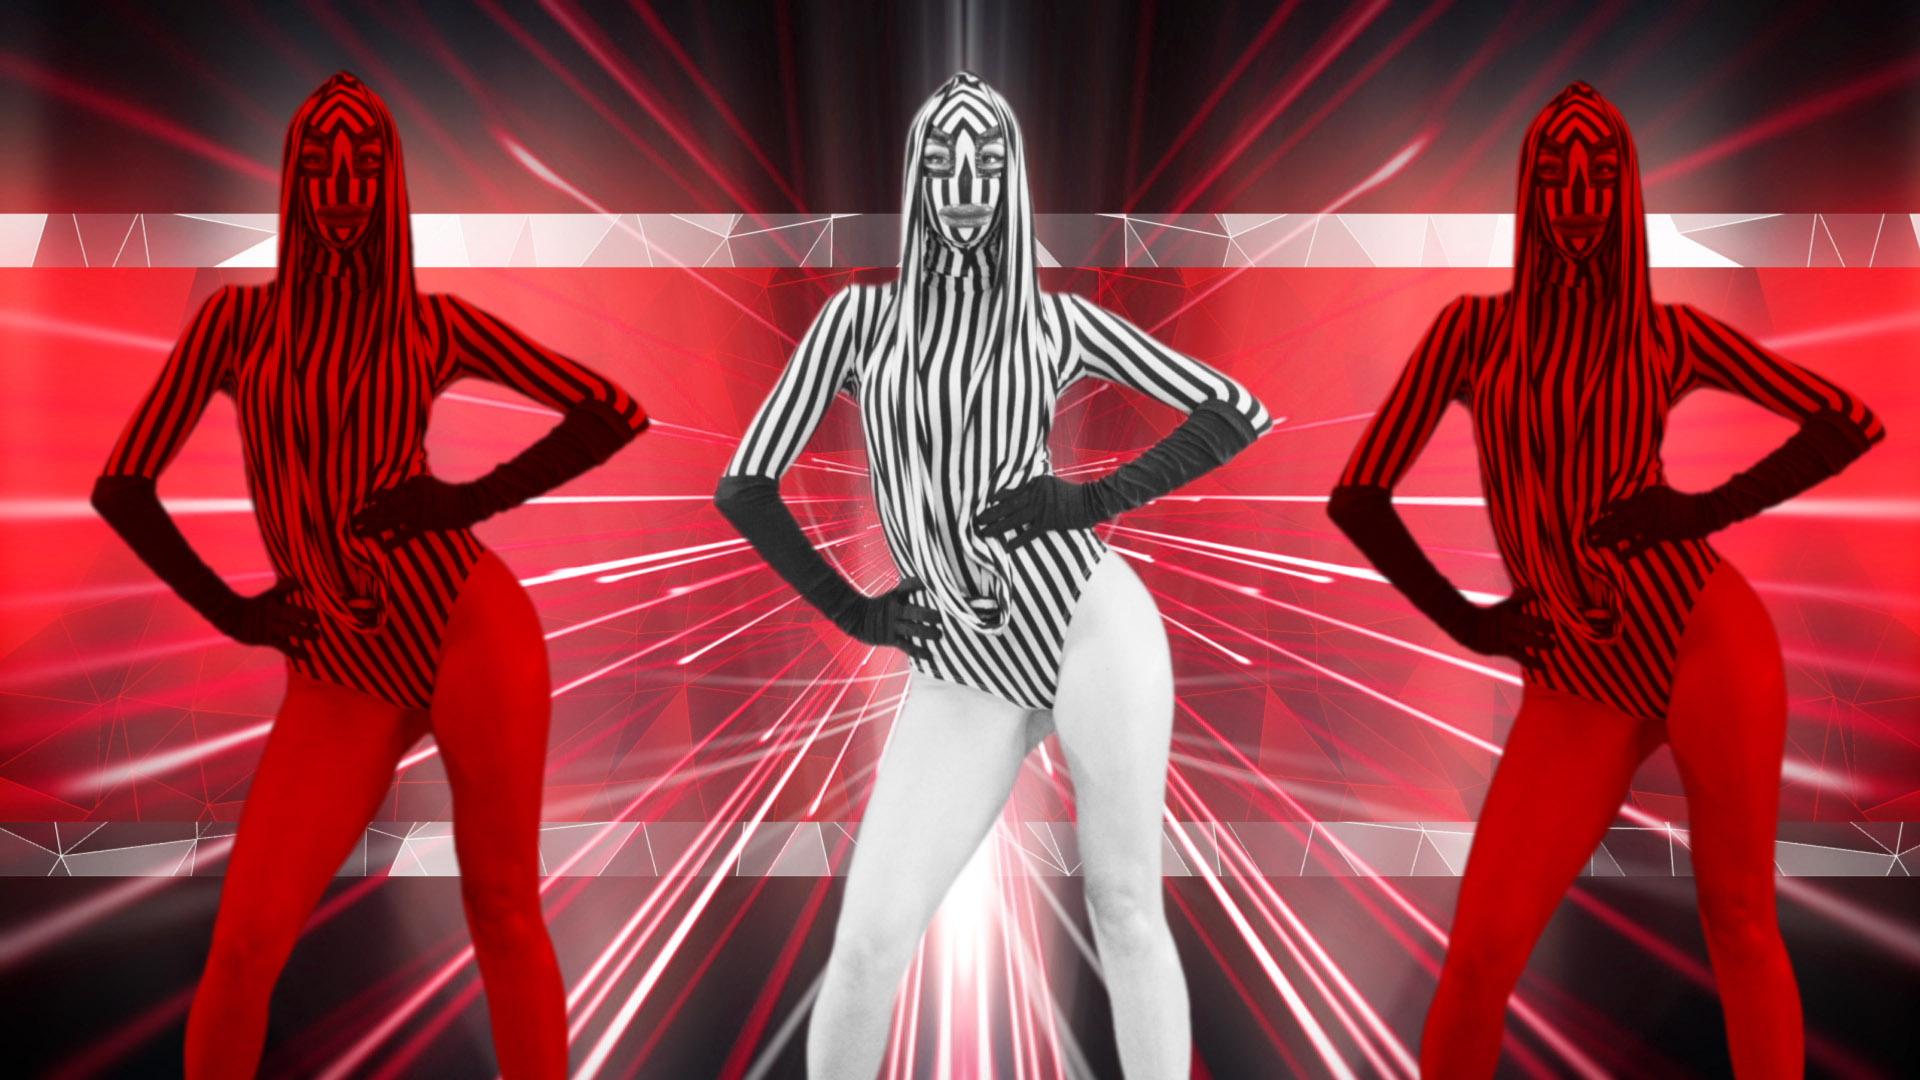 Red Evil Go Go Girl Horn Demons stock footage Video art vj loop